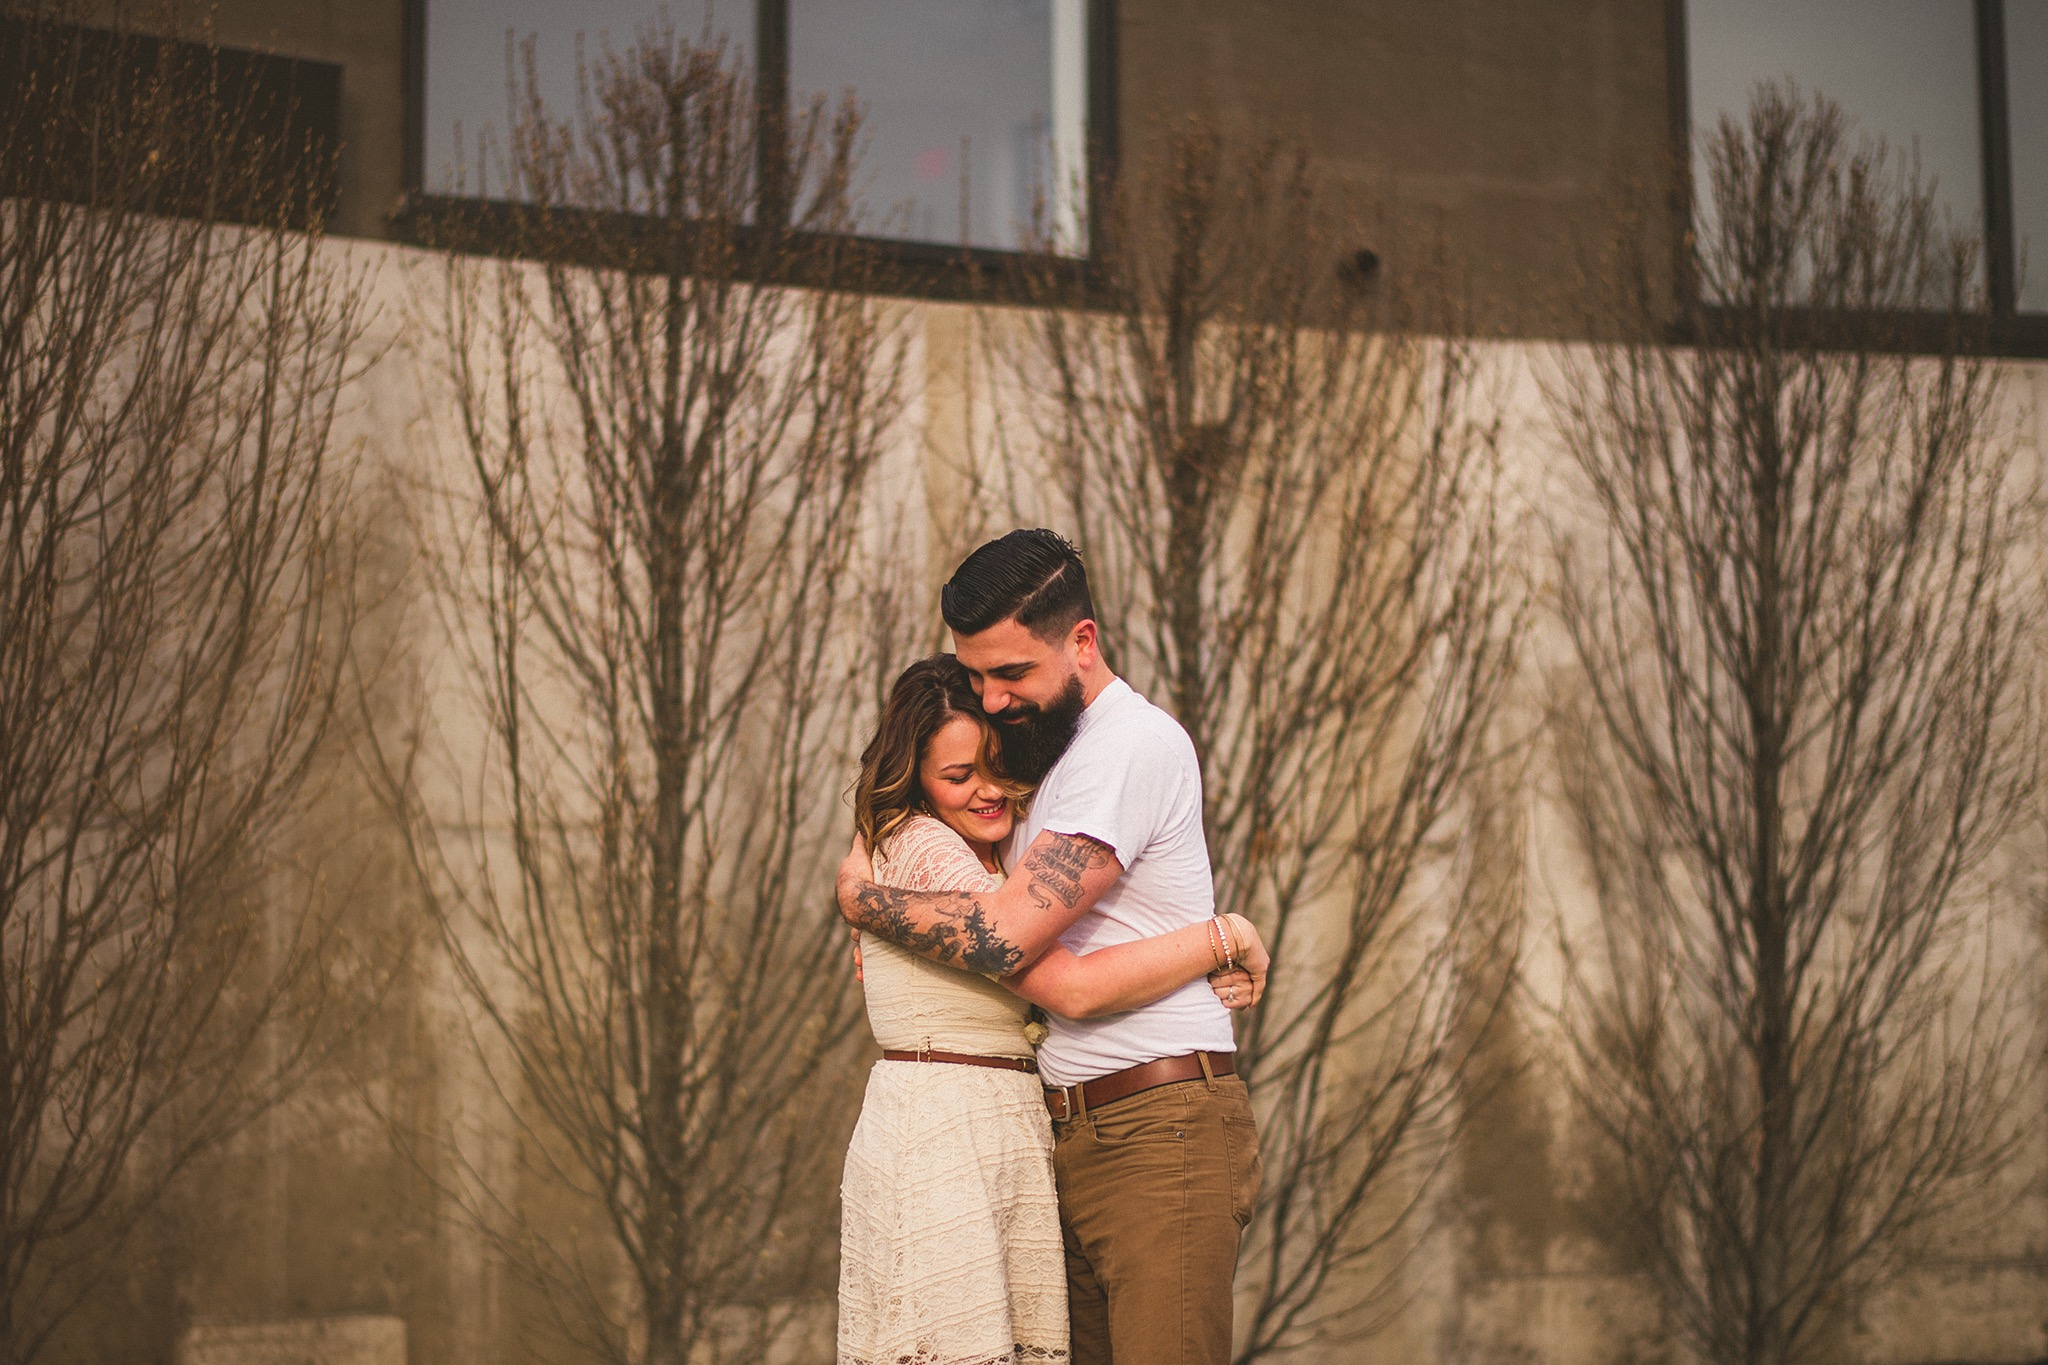 6-couple-hugging-beacon.jpg